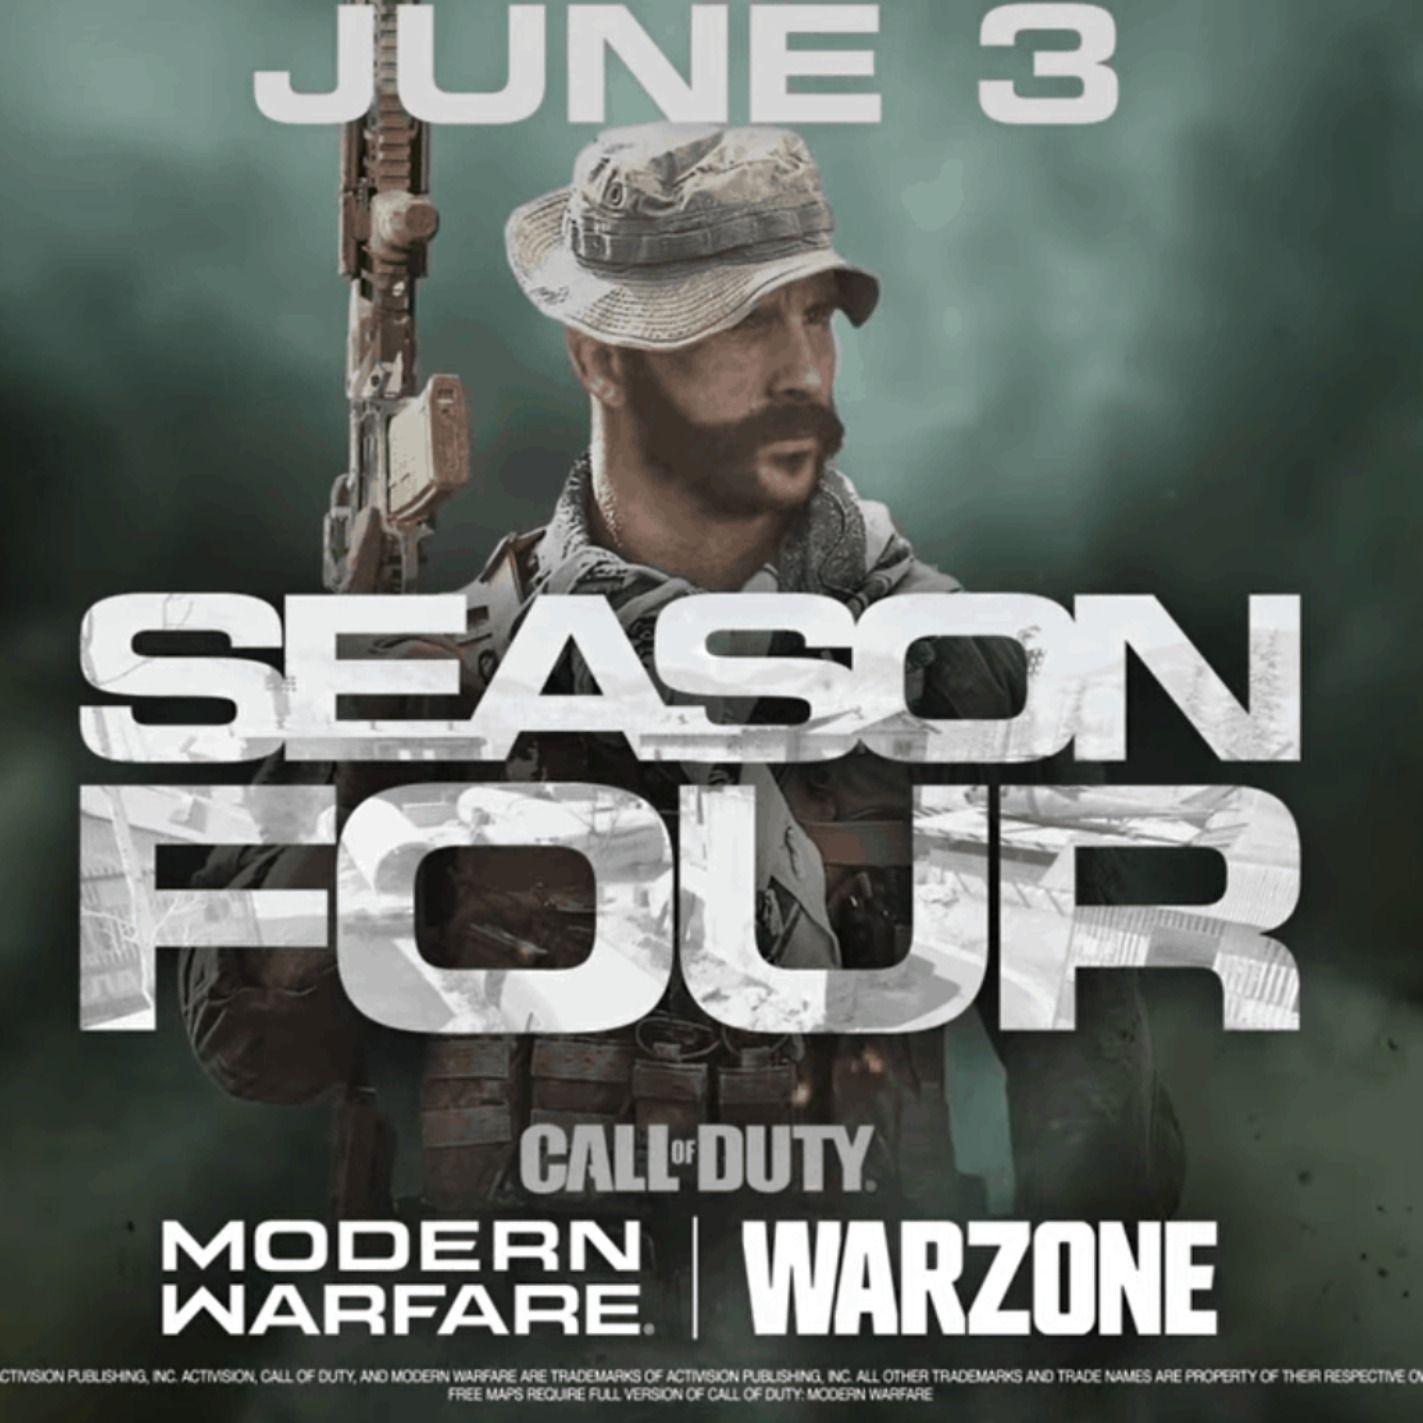 Call Of Duty Warzone Season 4 Coming June 3 In 2020 Call Of Duty Modern Warfare Cod Wars